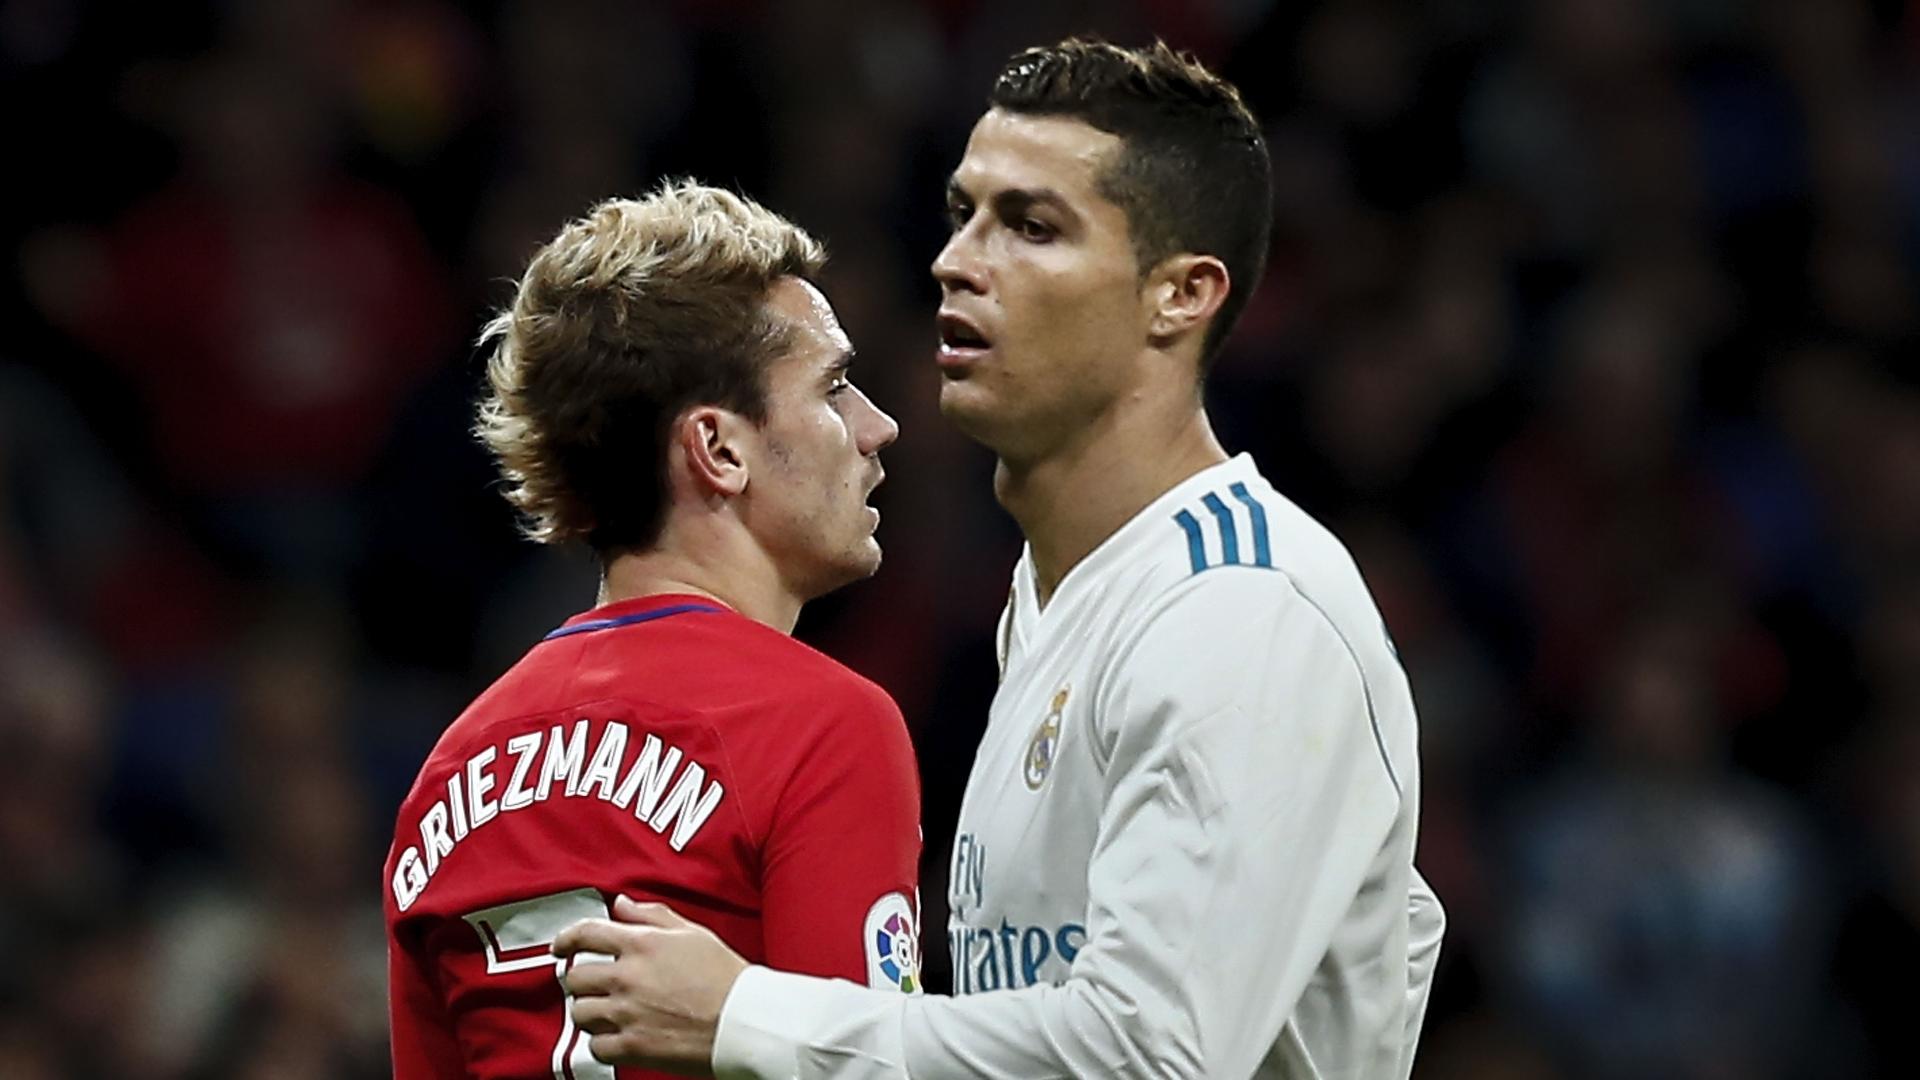 Real Madrid 6/5 to beat Atletico Madrid in Saturday's La Liga showdown